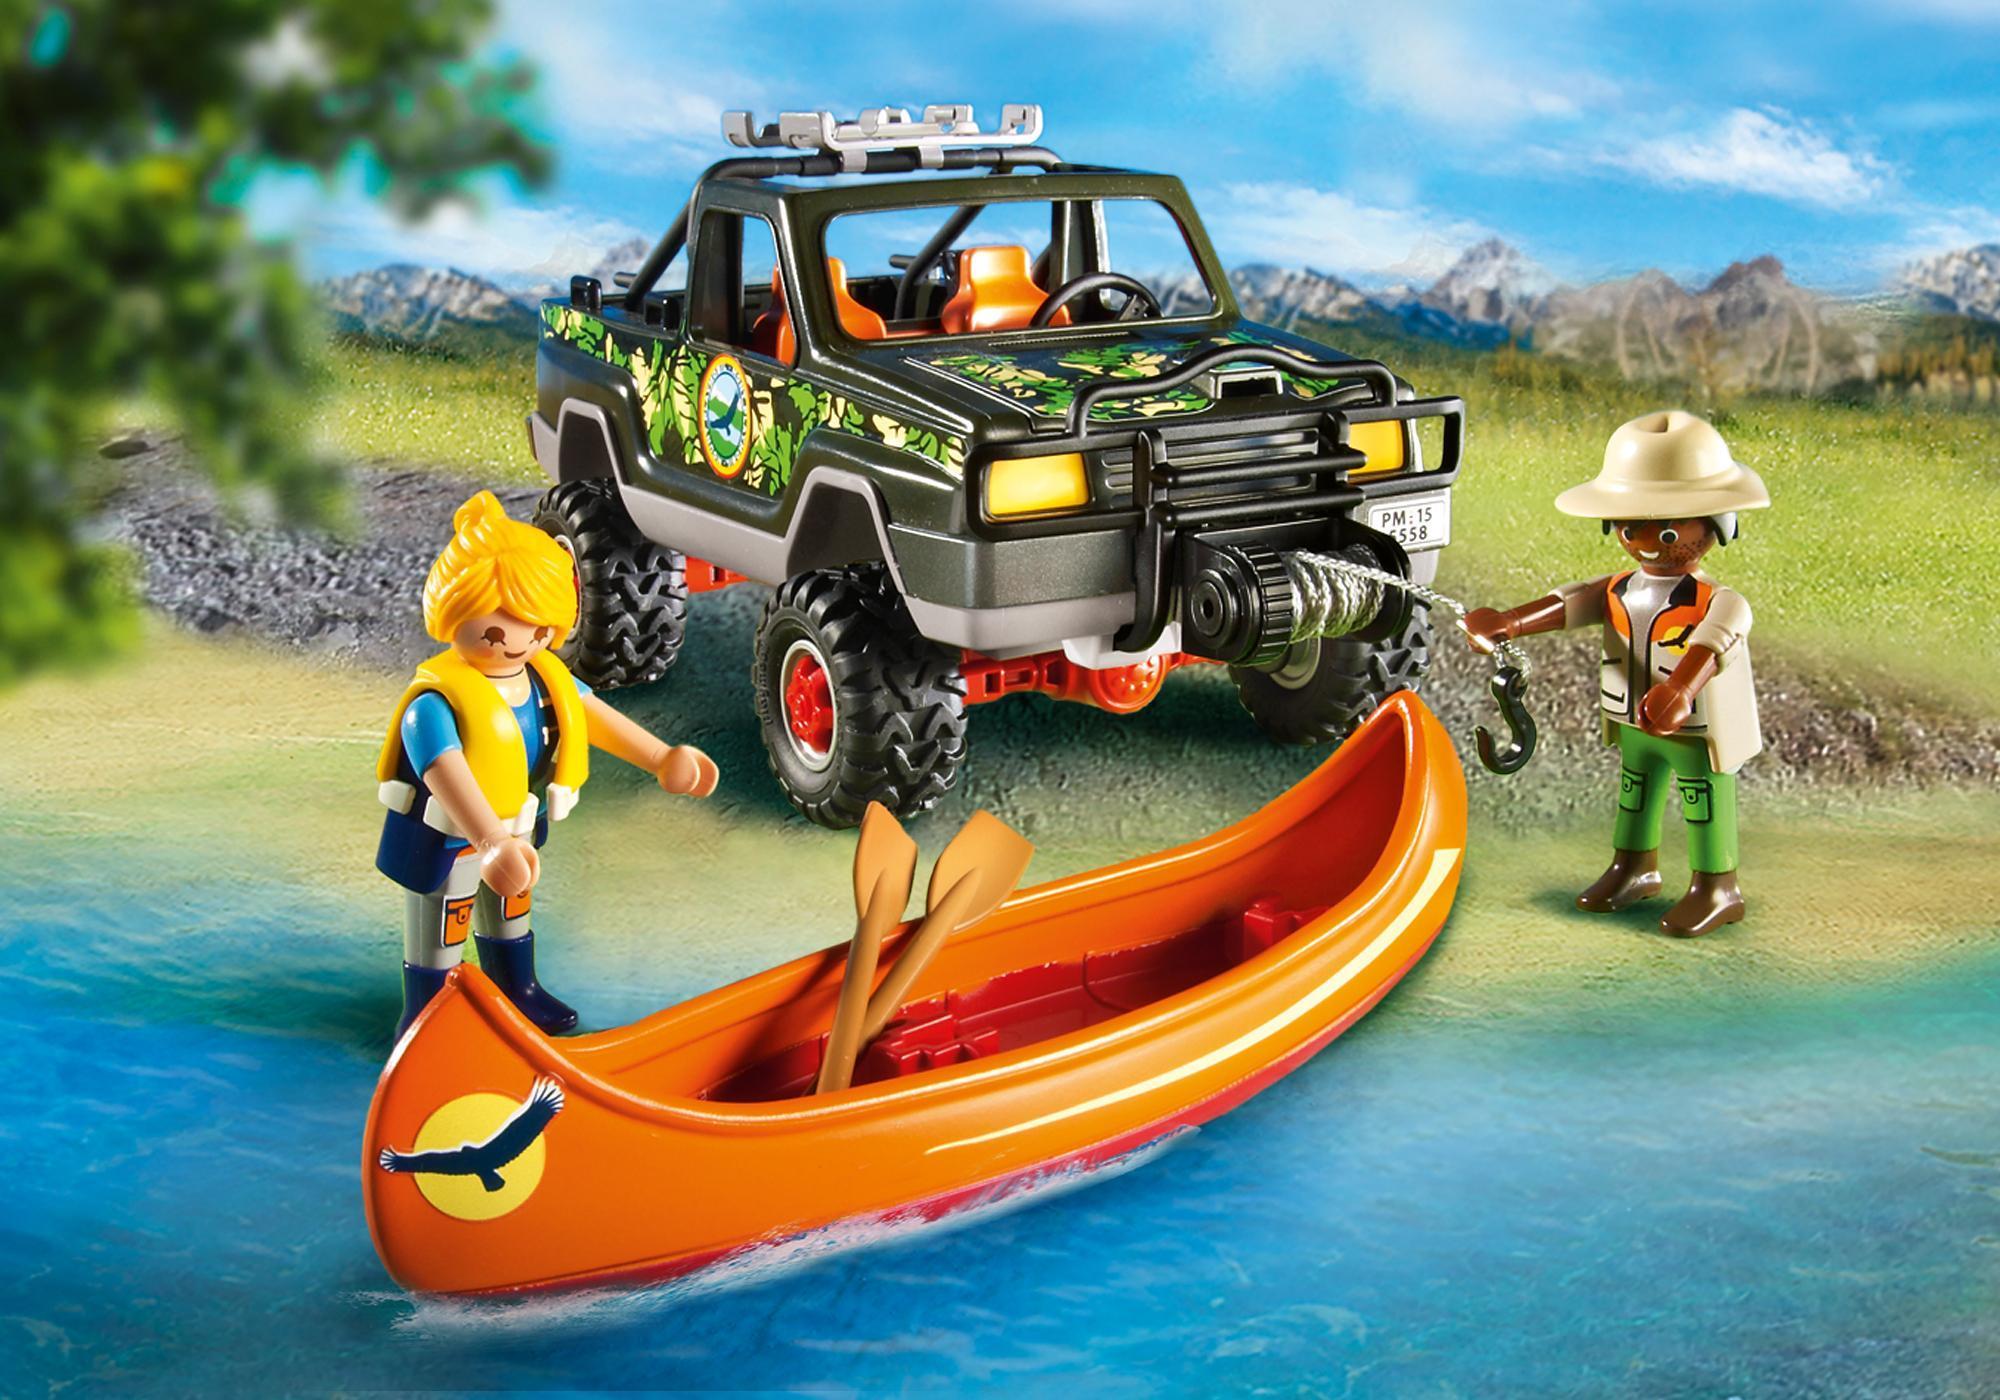 http://media.playmobil.com/i/playmobil/5558_product_extra2/Abenteuer-Pickup